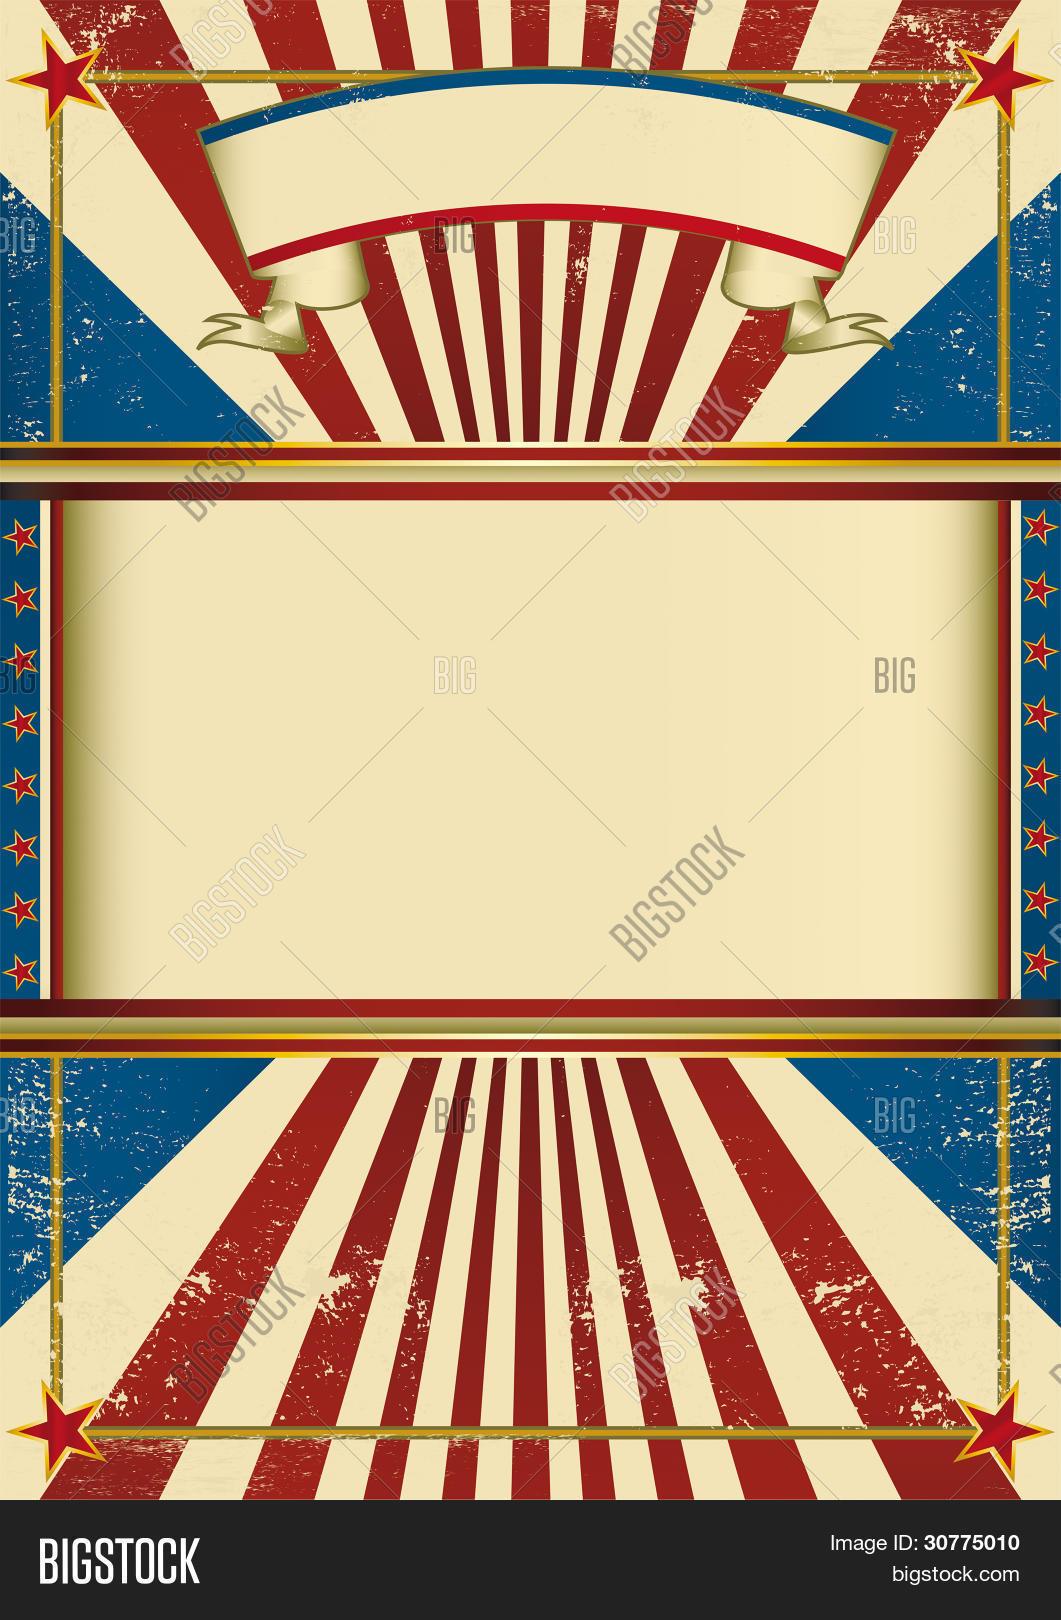 Vintage Poster Circus. Vintage Vector & Photo | Bigstock